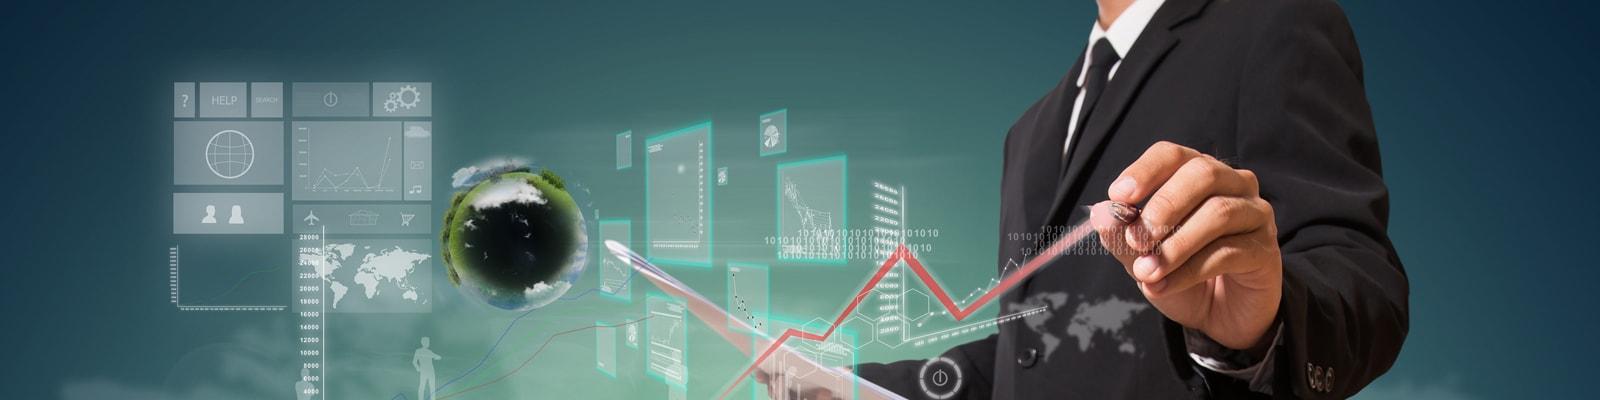 Tom Brough - Capital Trust Wealth Management image 3